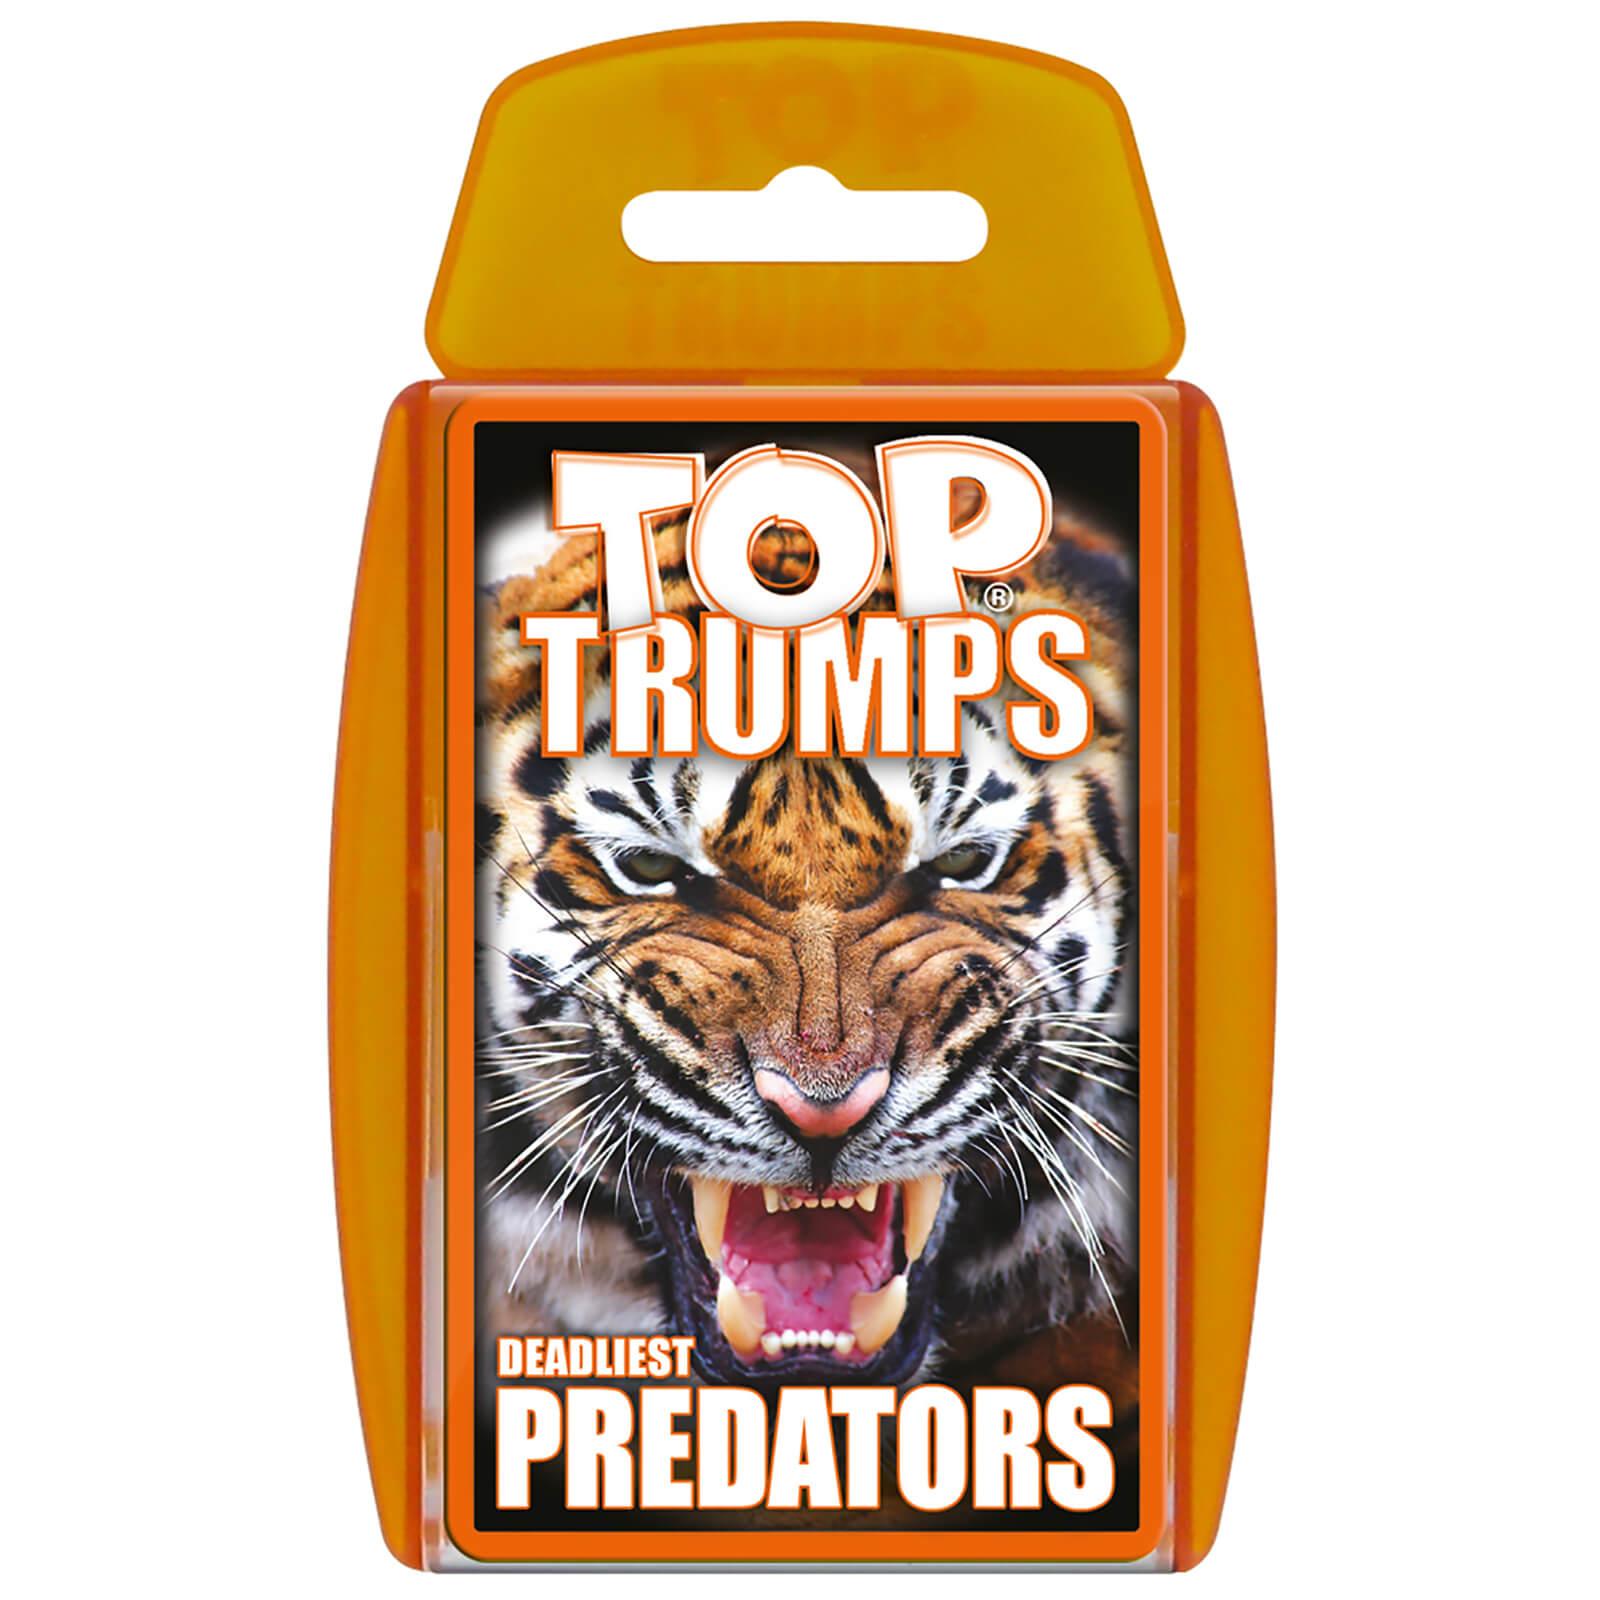 Image of Top Trumps Card Game - Predators Edition